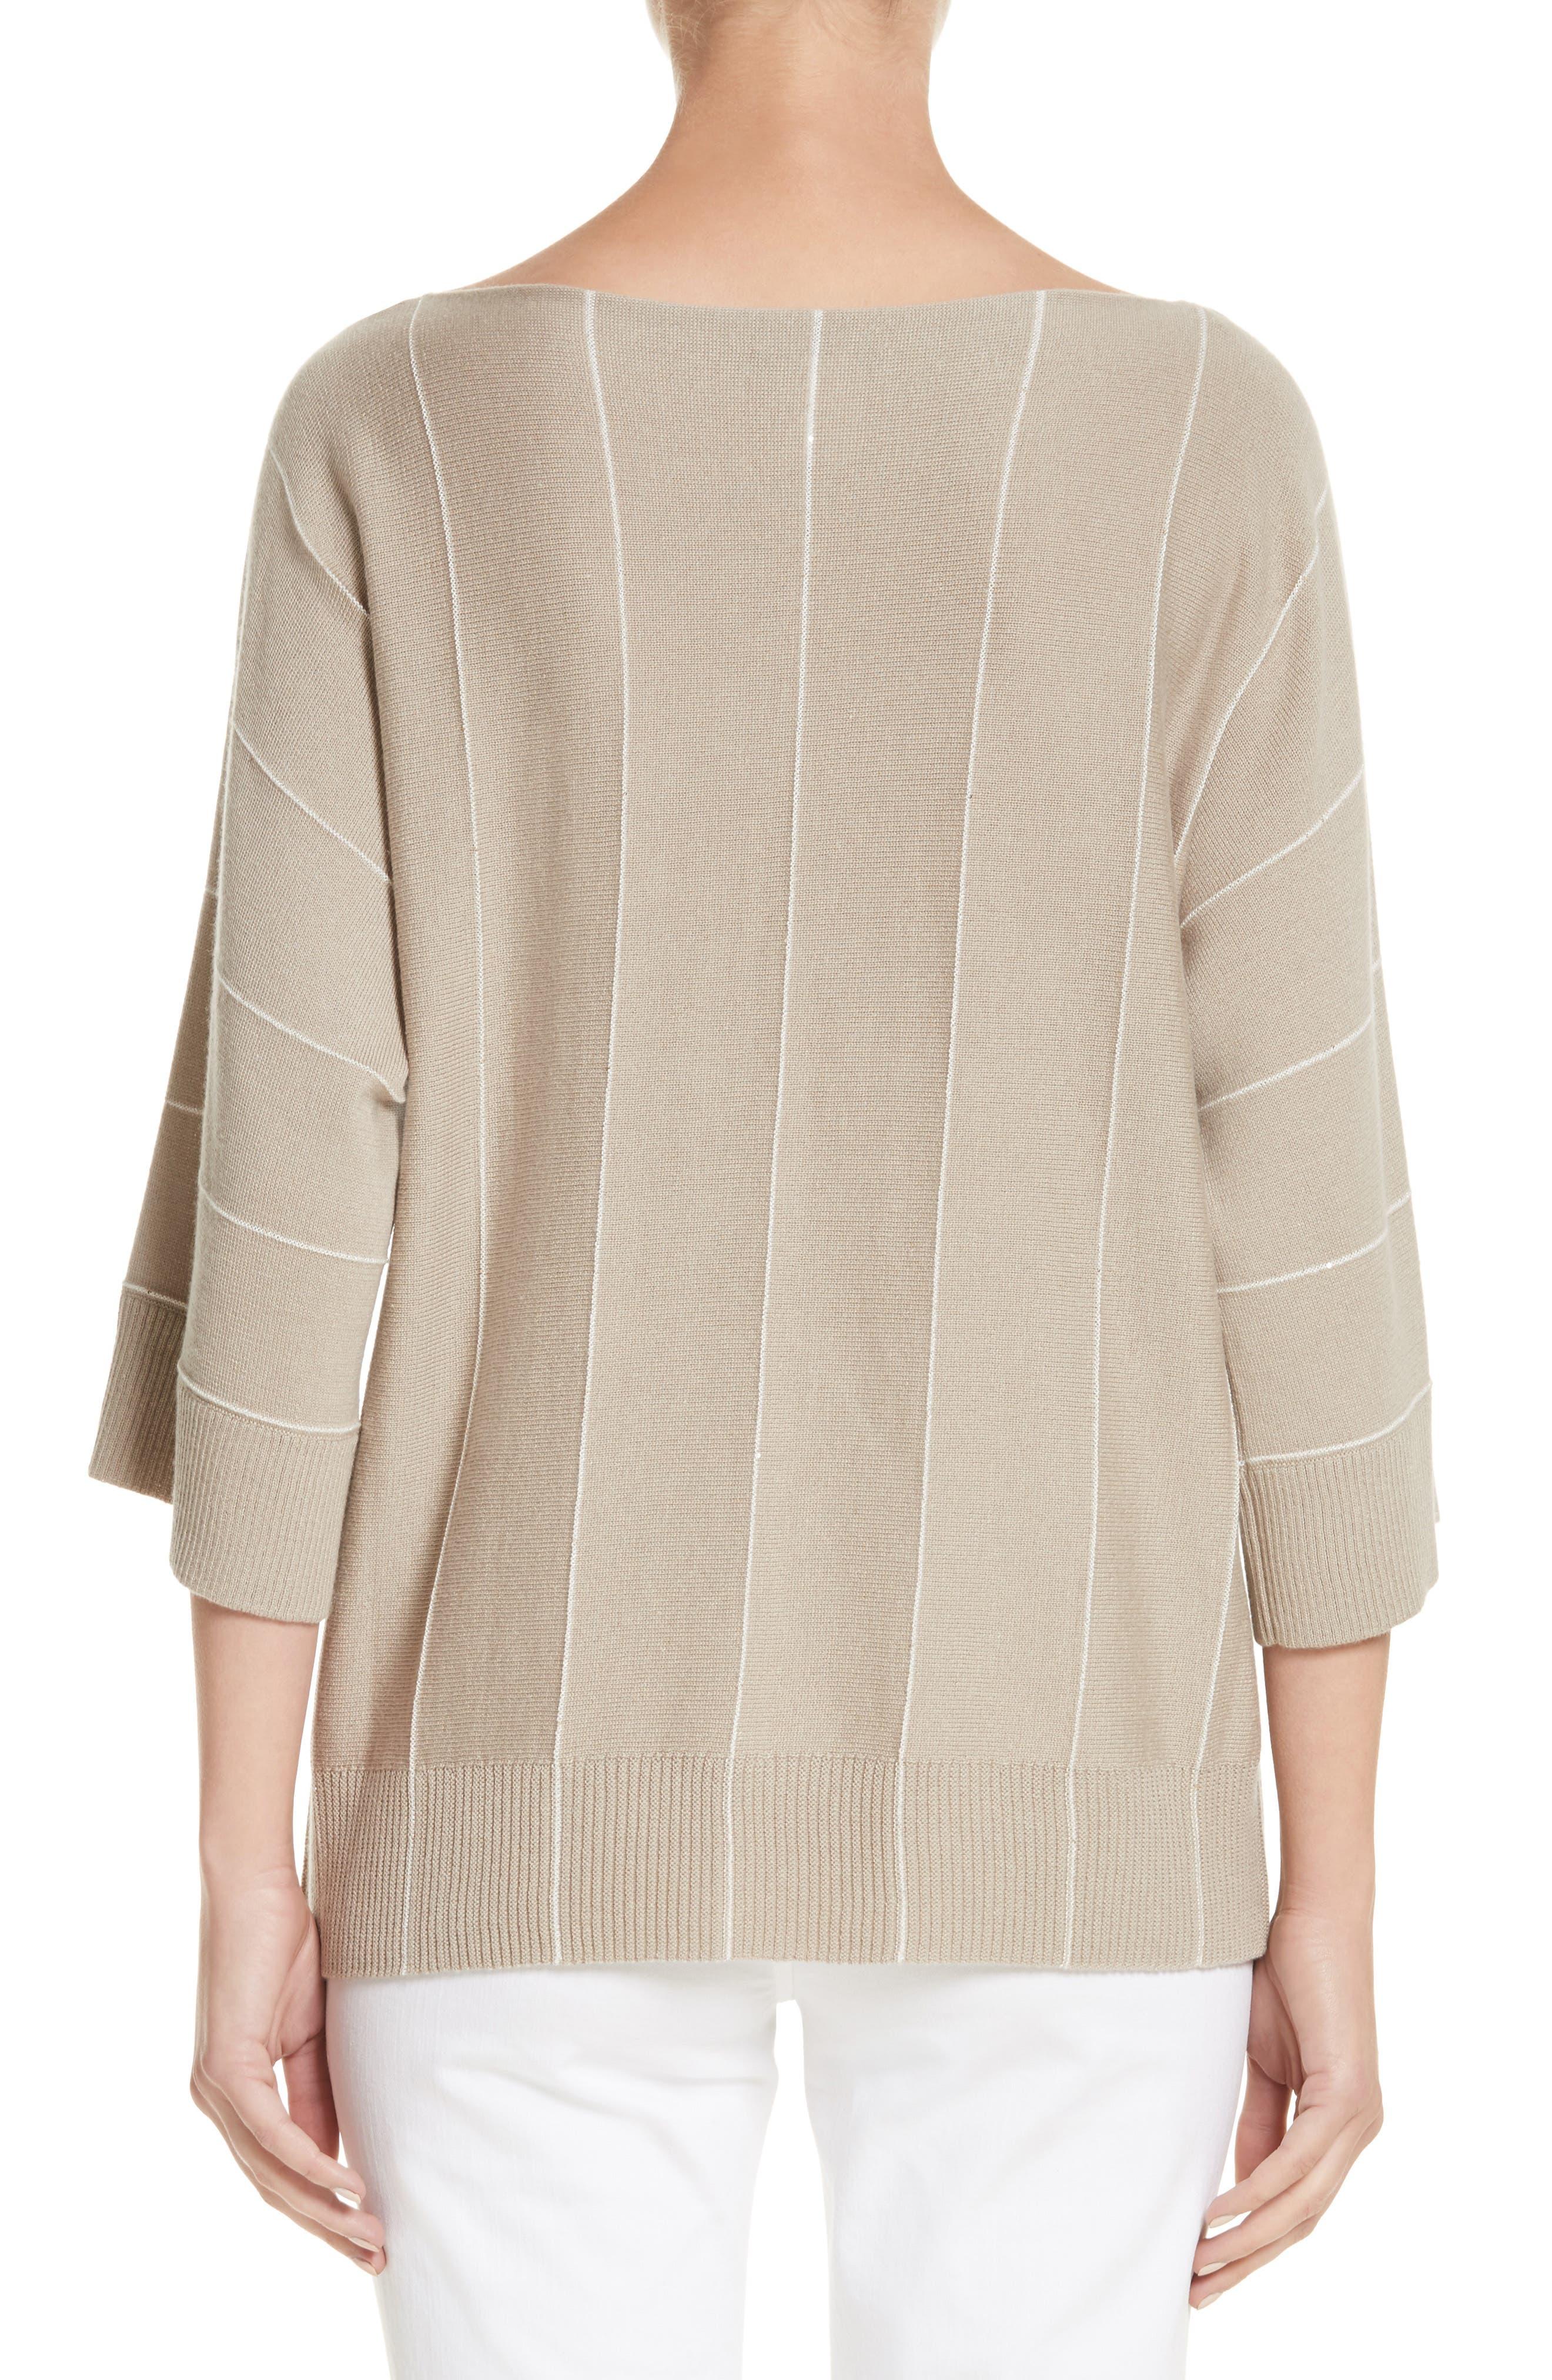 Sequin Knit Cashmere & Silk Pullover,                             Alternate thumbnail 2, color,                             Khaki Multi